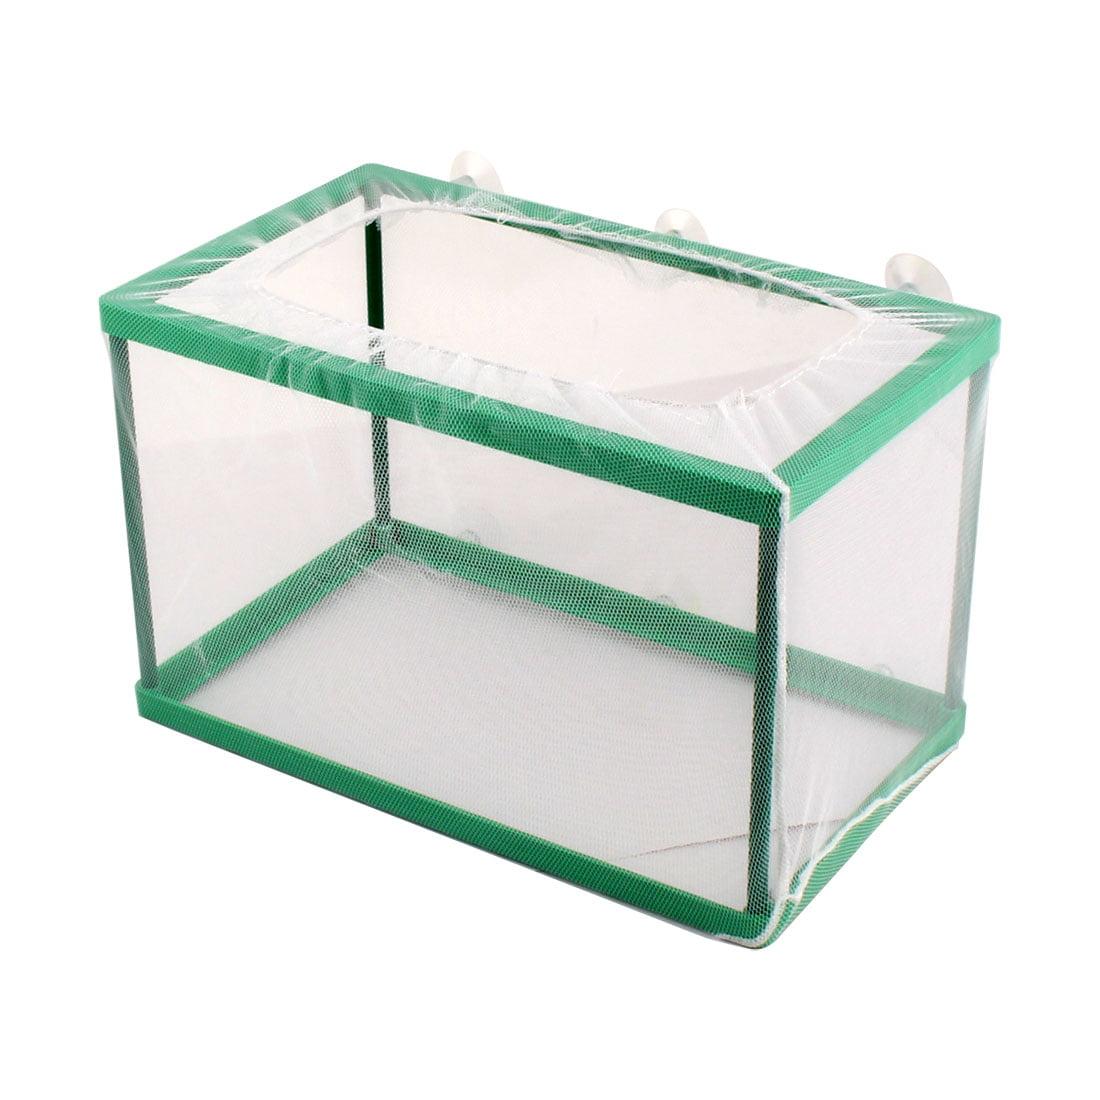 Aquarium Fishbowl Tank Floating Box Fry Shrimp Breeding Cage Net White Green